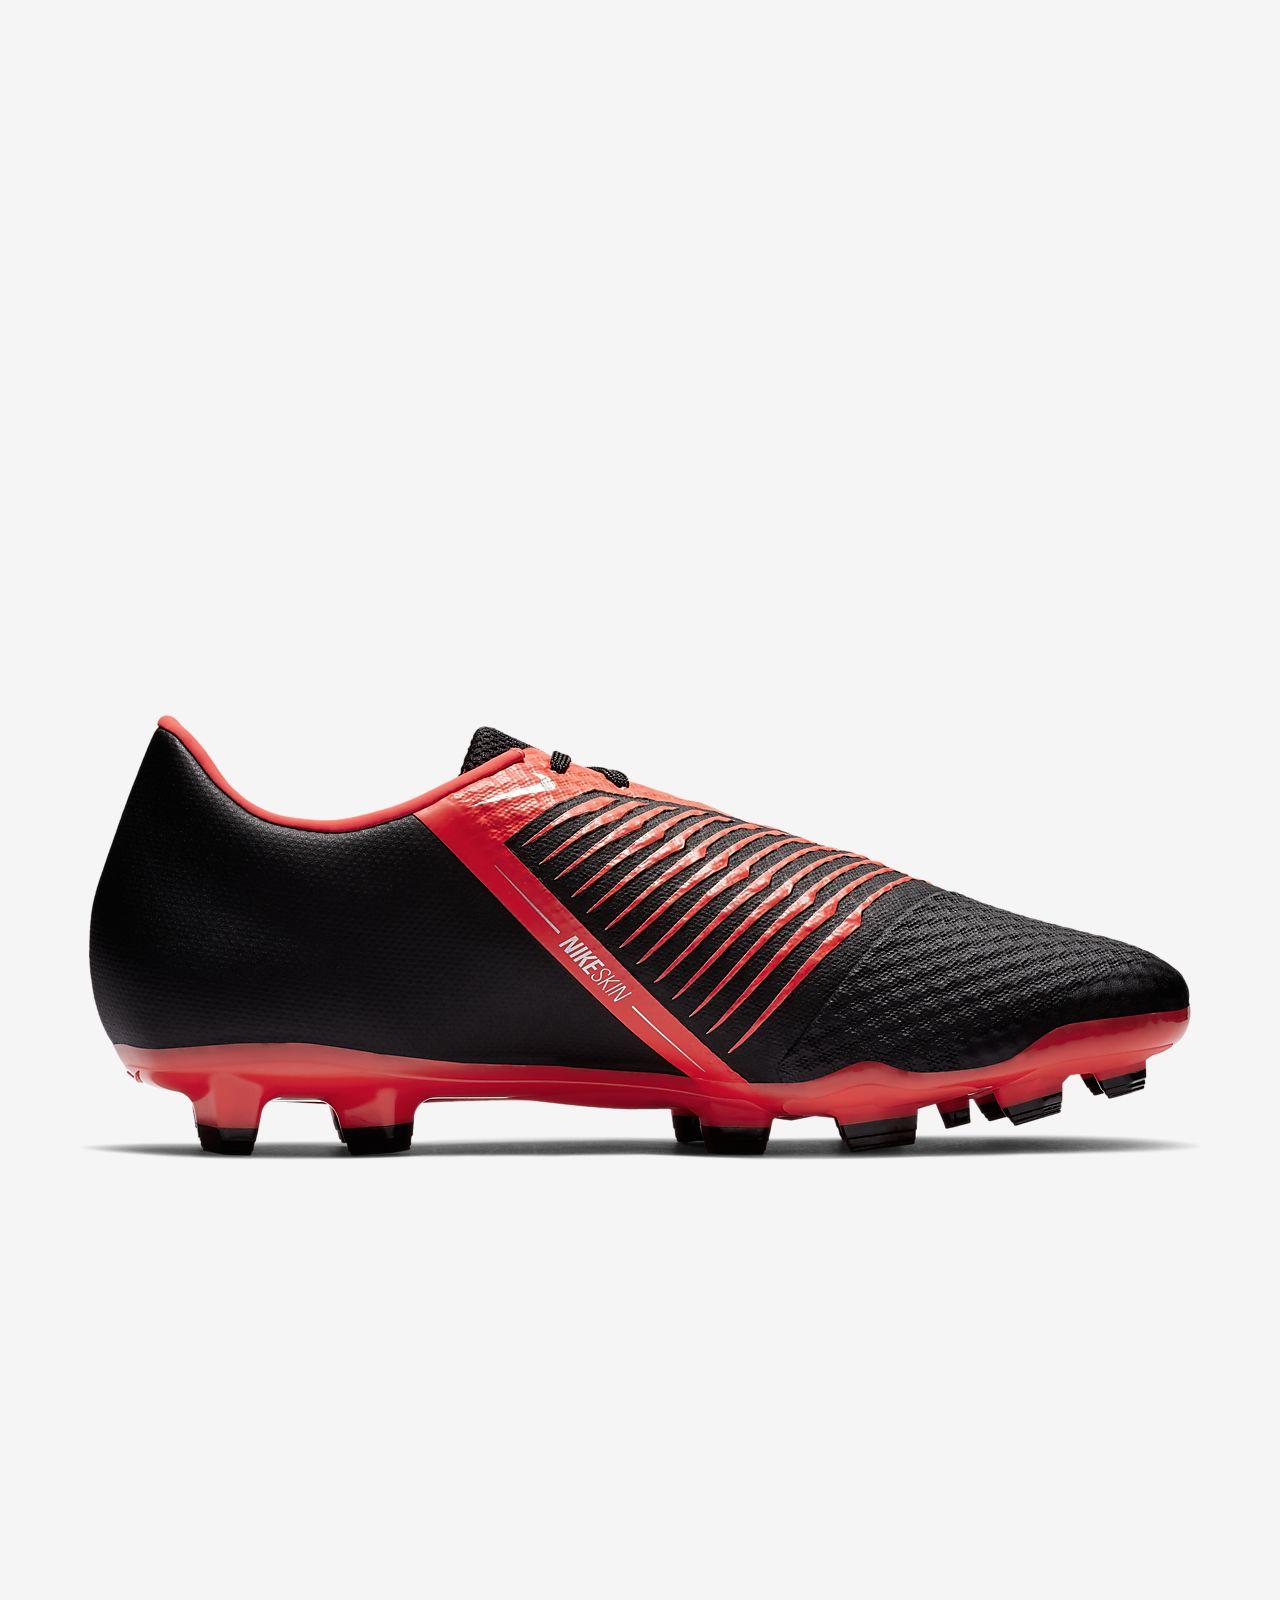 be0ef539c6f0a Nike Phantom Venom Academy FG Firm-Ground Football Boot